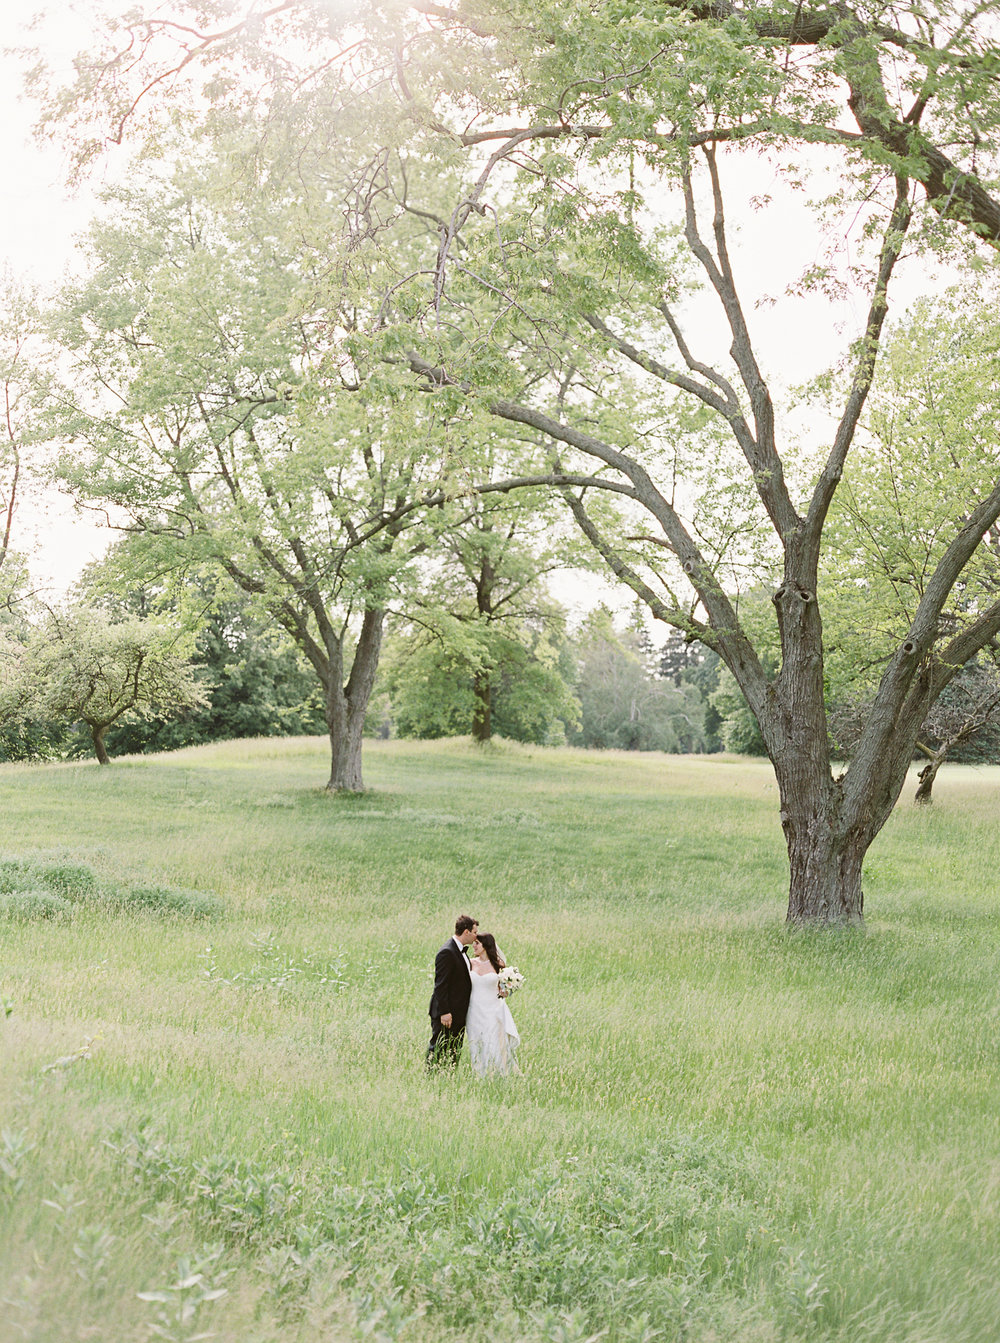 0333-Nadia-Chris-Married-When He Founf Her-Toronto Golf Club.jpg